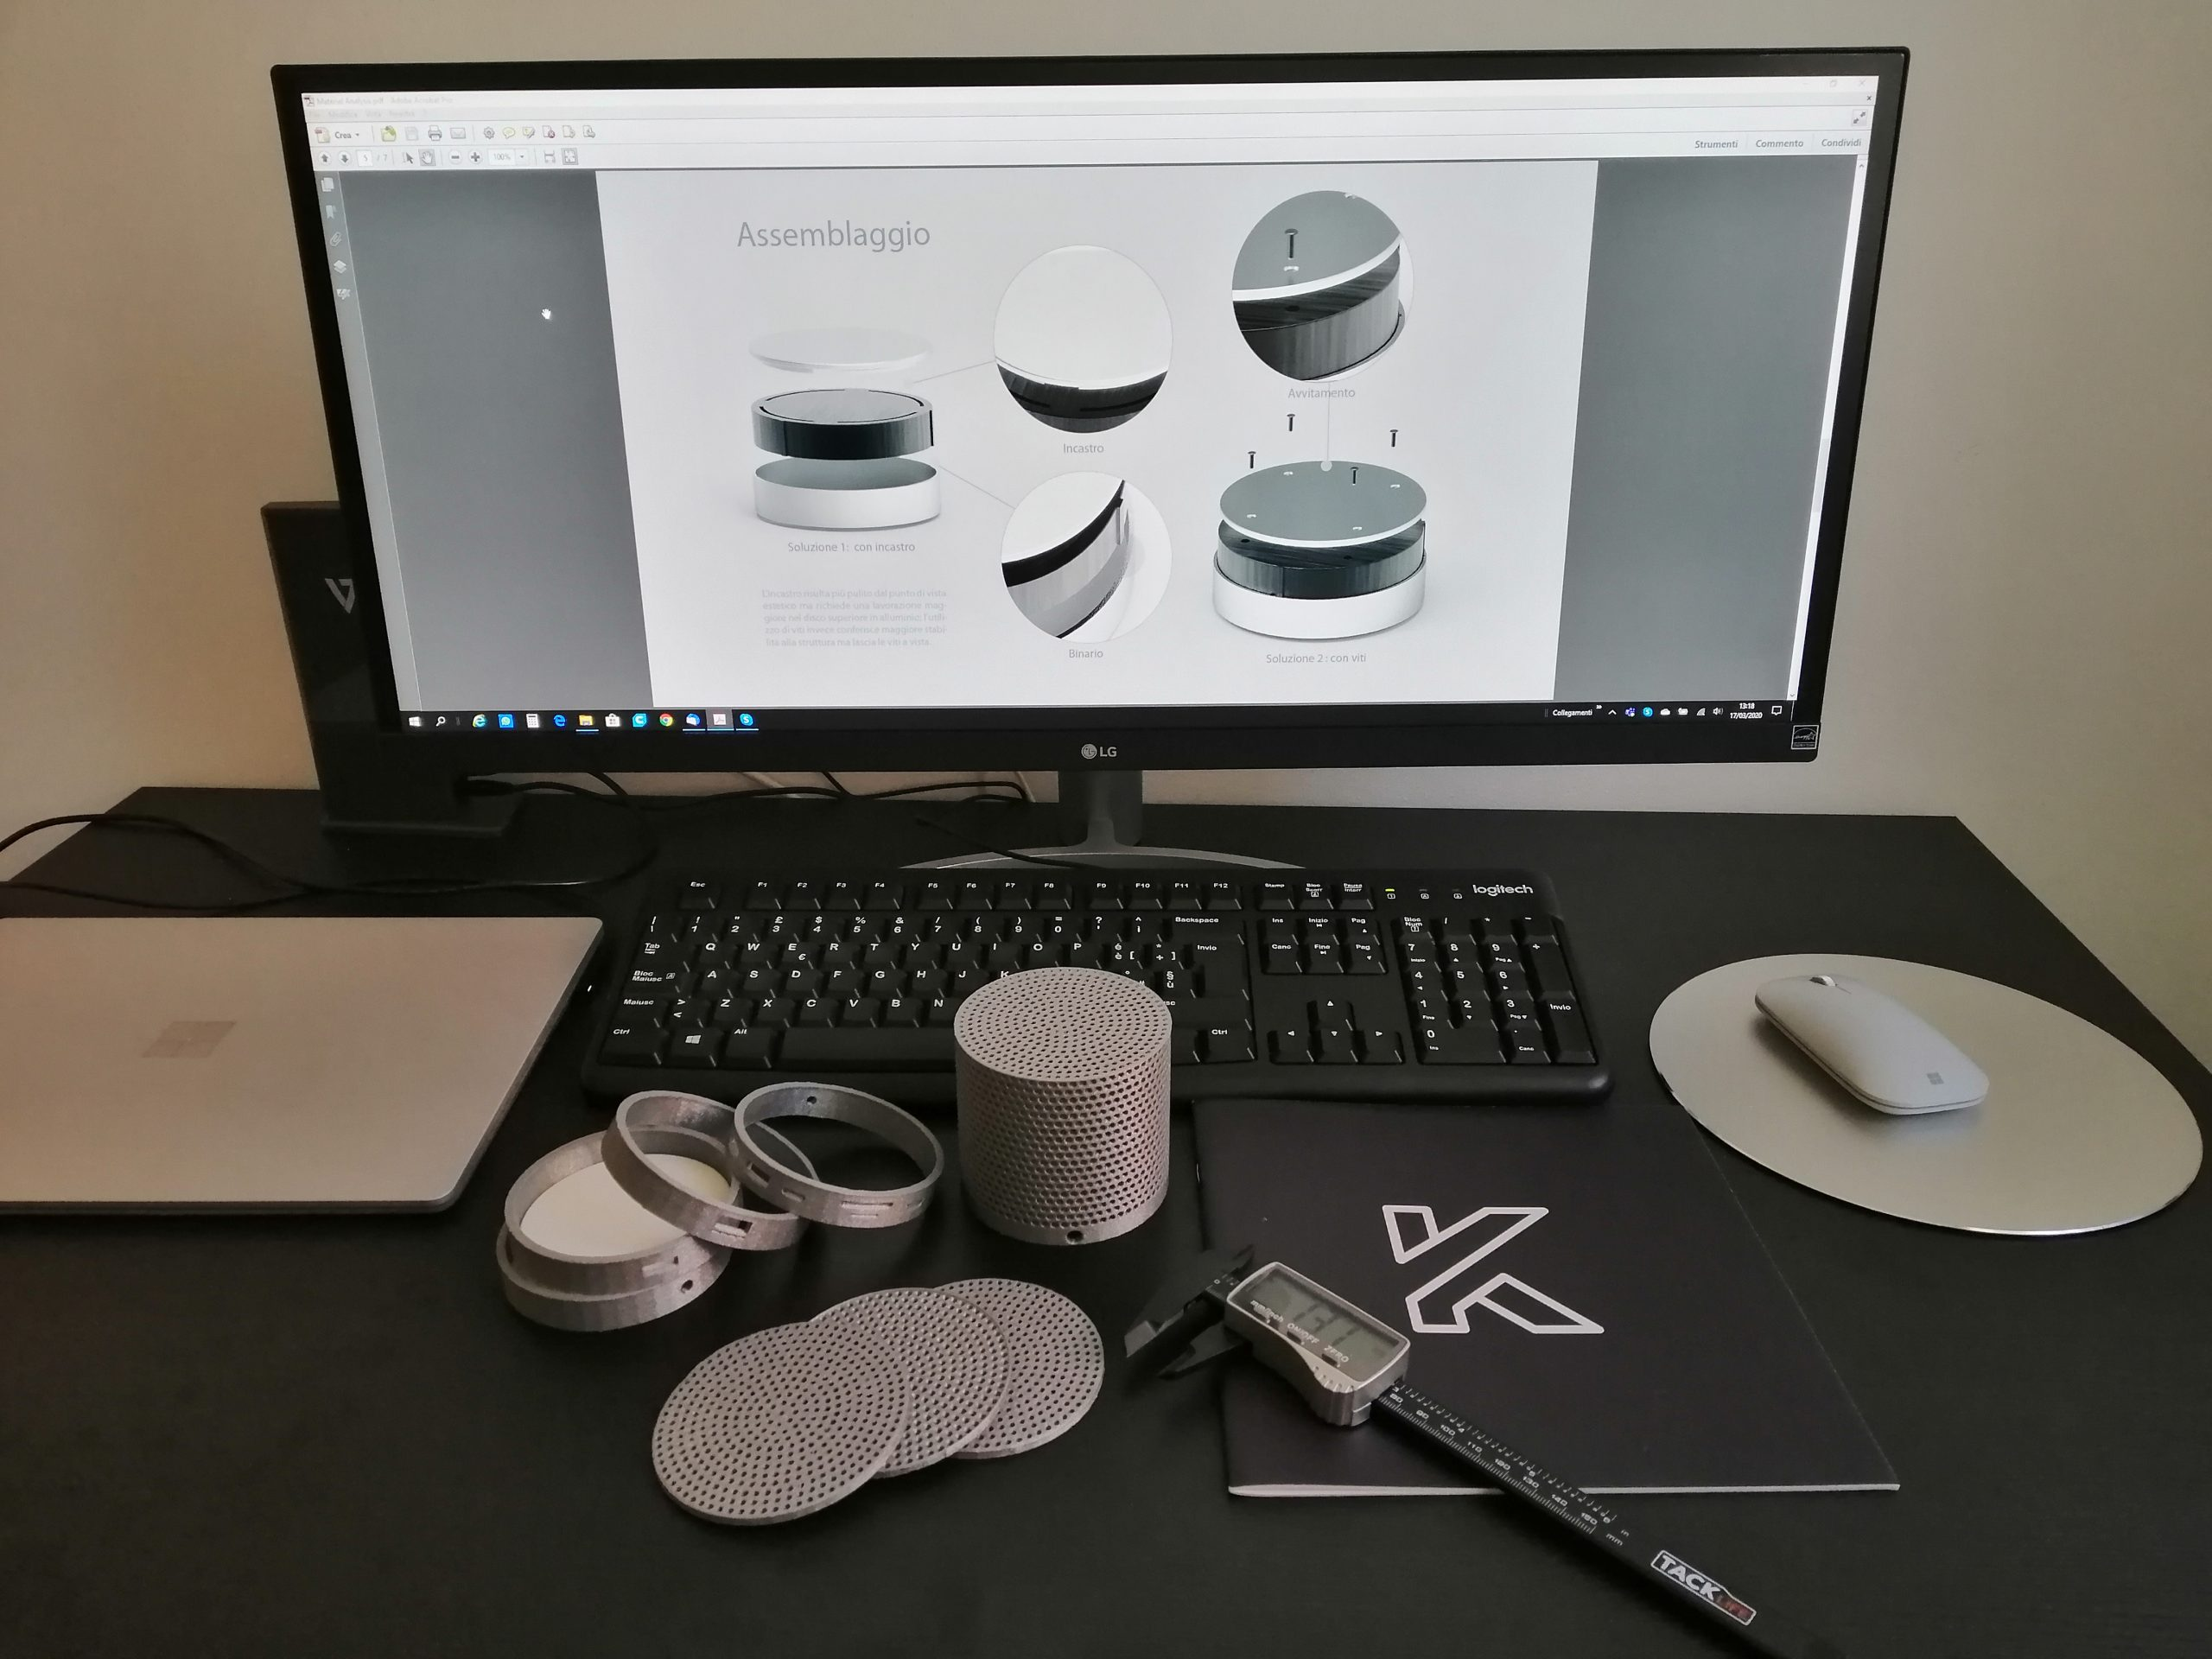 Stampa 3D MockUp Apple - KreaItaly, Stampa 3d - Stampanti 3d Marche - Stampanti 3D prezzi - Aziende stampa 3d